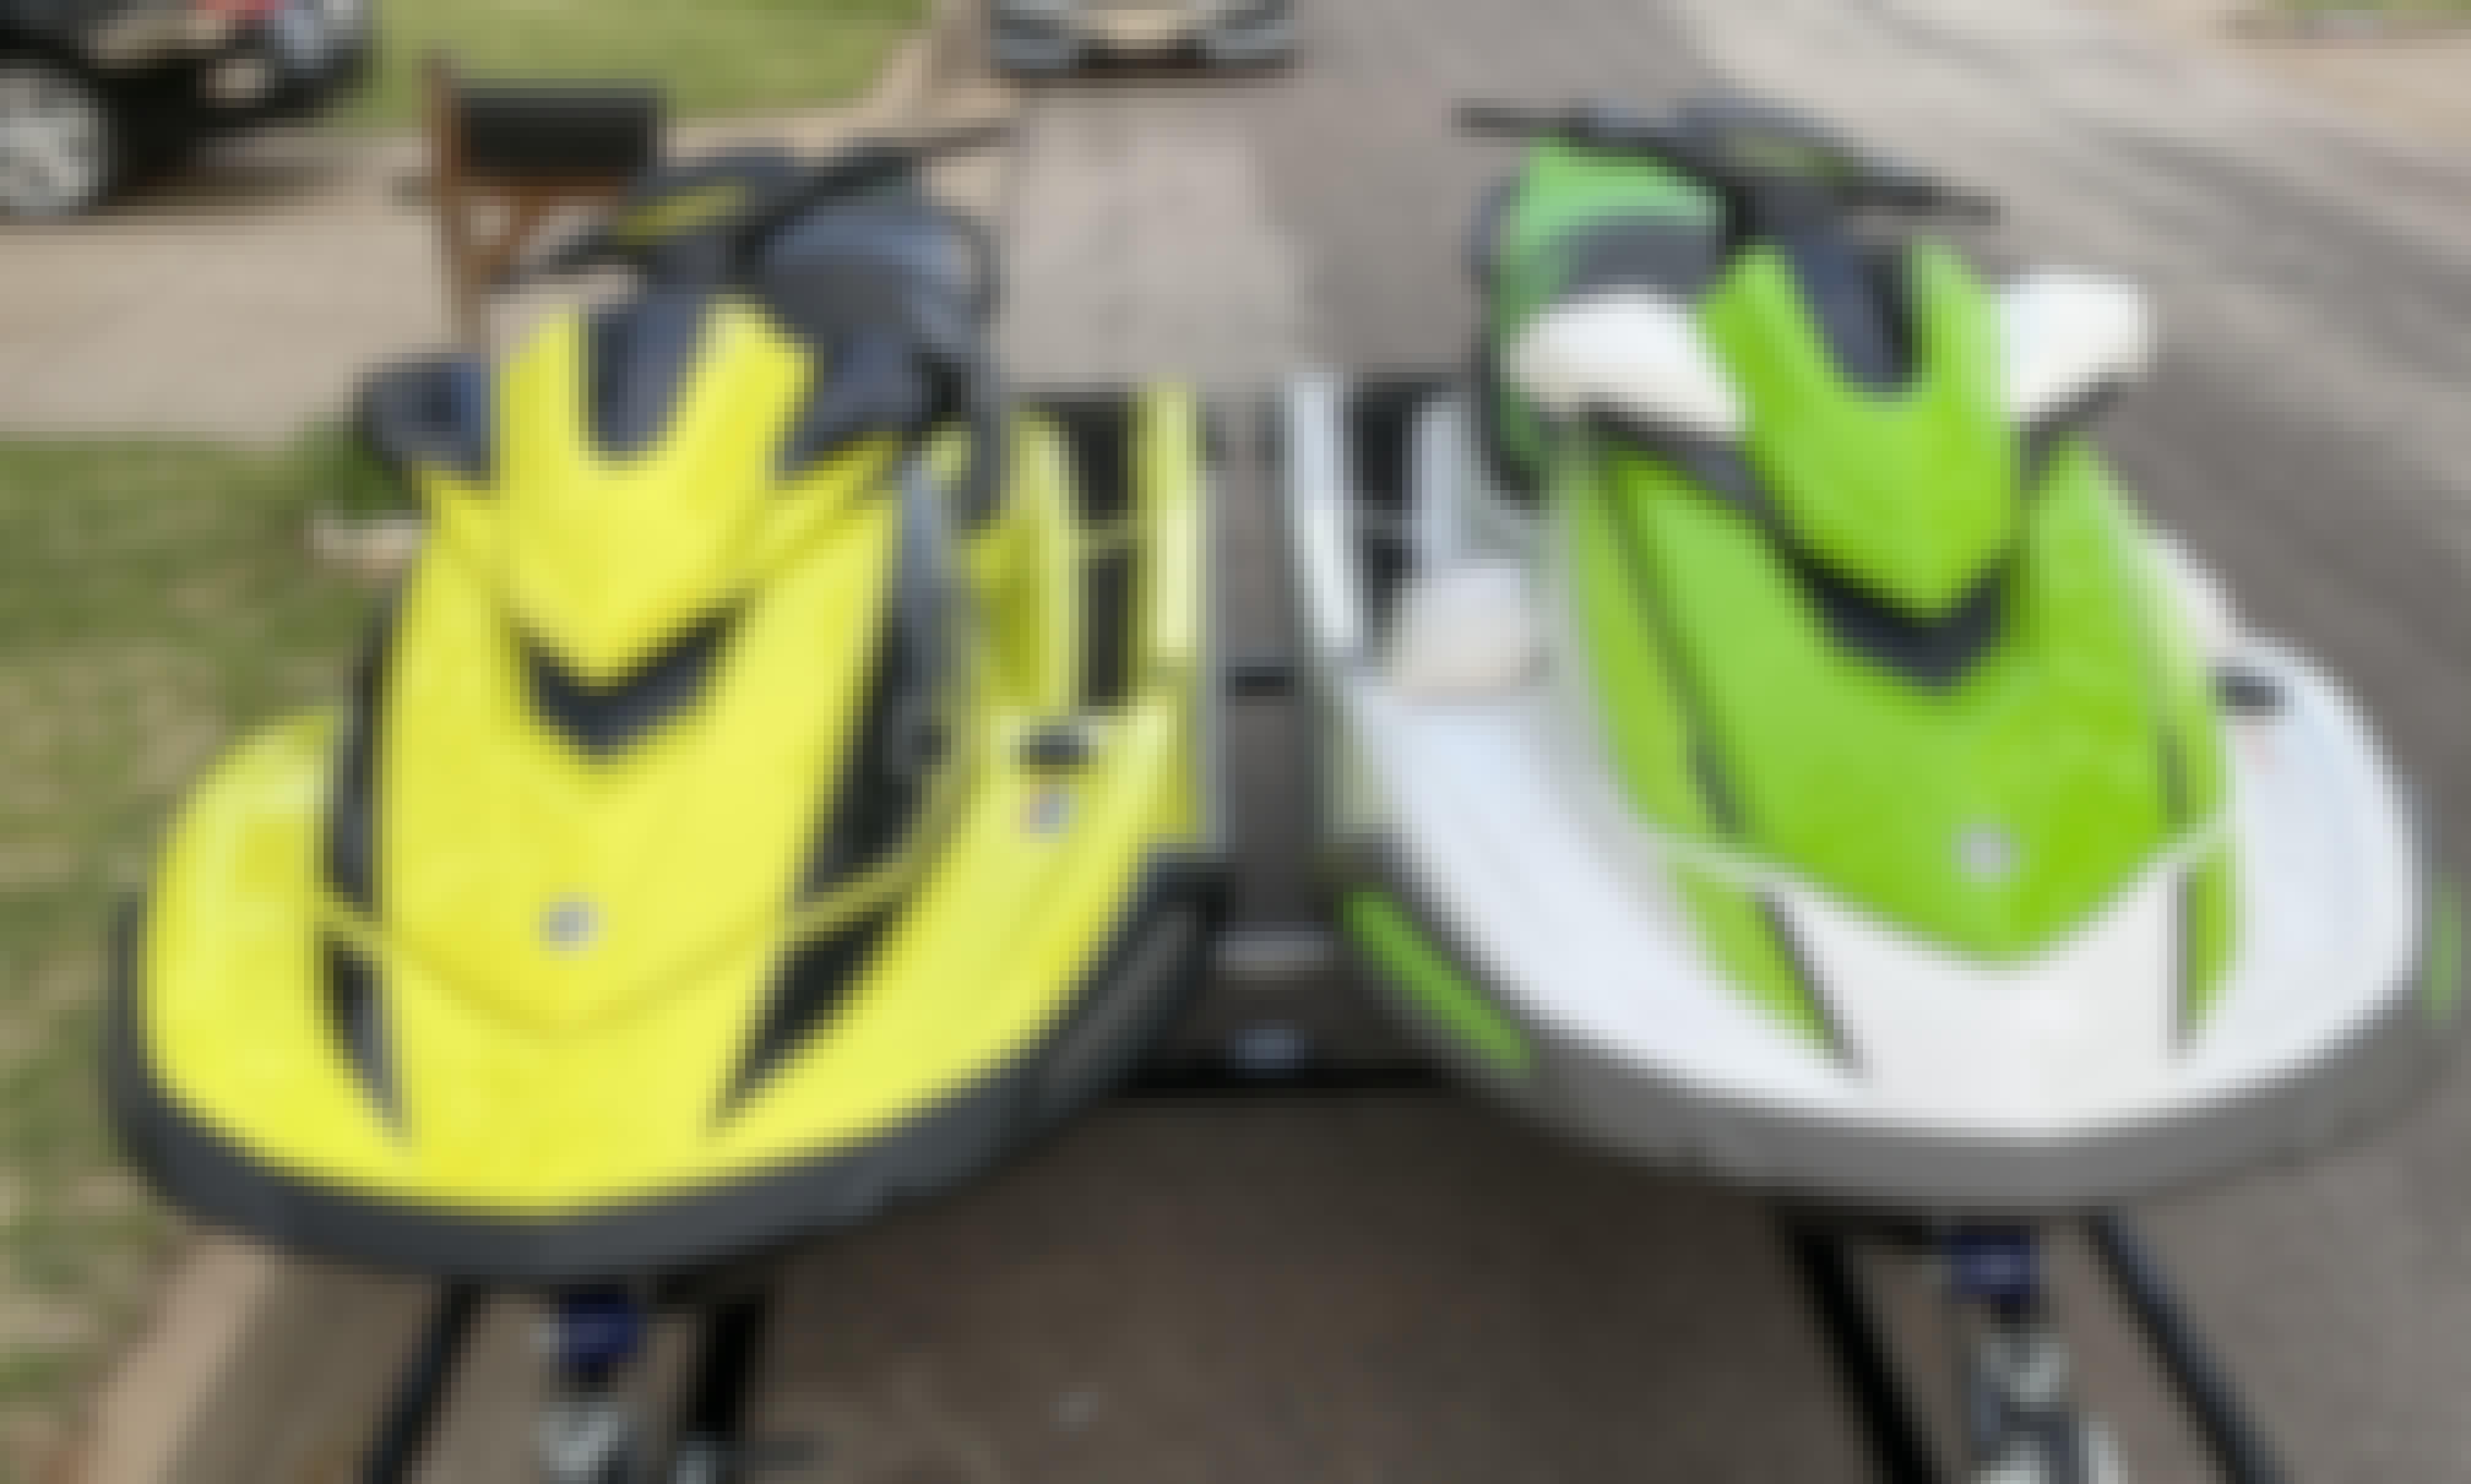 2021 Yamaha Waverunner Jet Skis For Rent x 2 | Lake Whitney